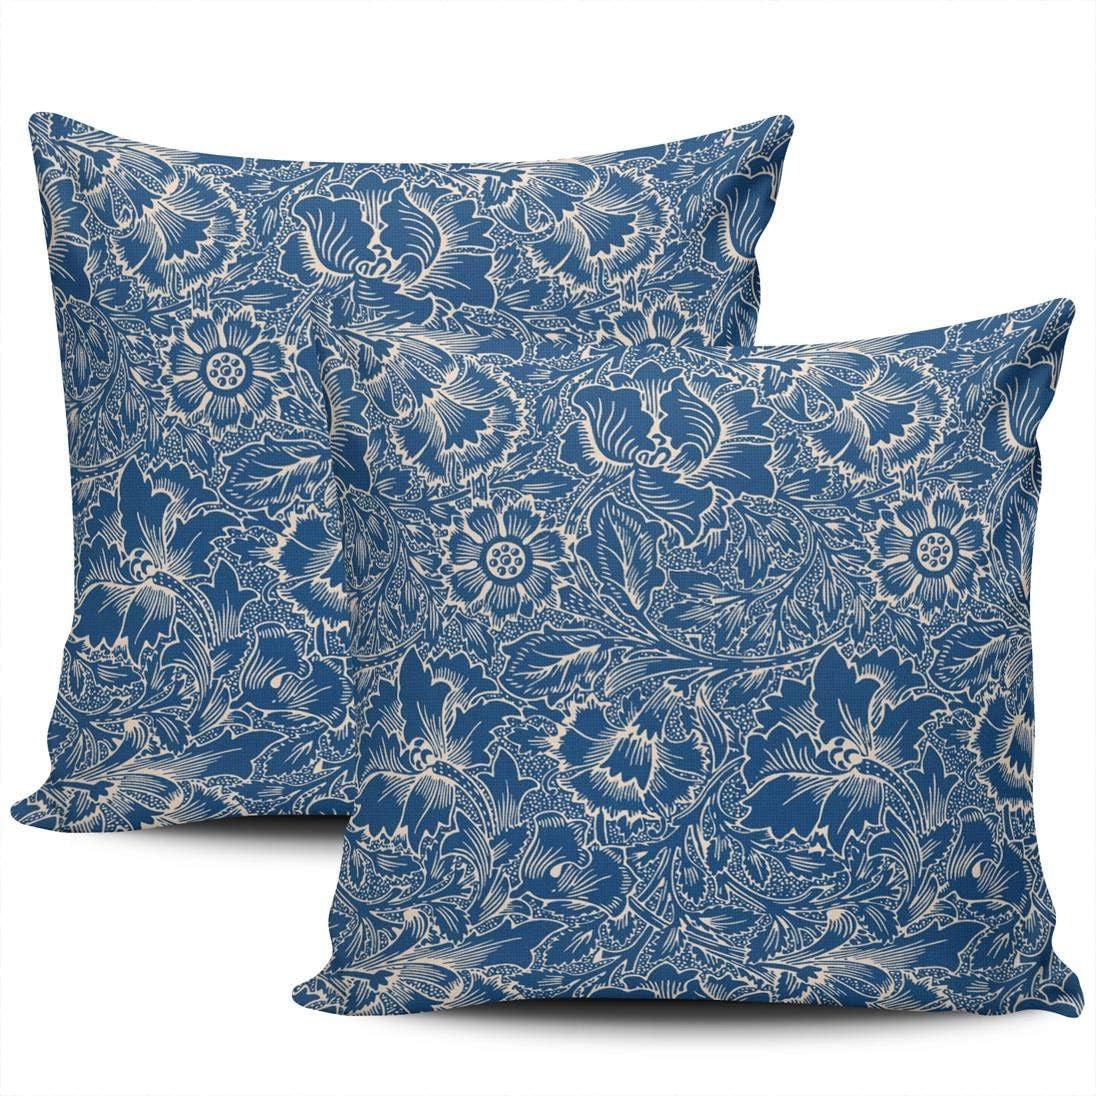 KELEMO Decorative Throw Pillow Case Cushion Cover Sofa Bedroom Monaco Blue Damask Pillowcase Double Printed Square 22 x 22 Inch Set of 2